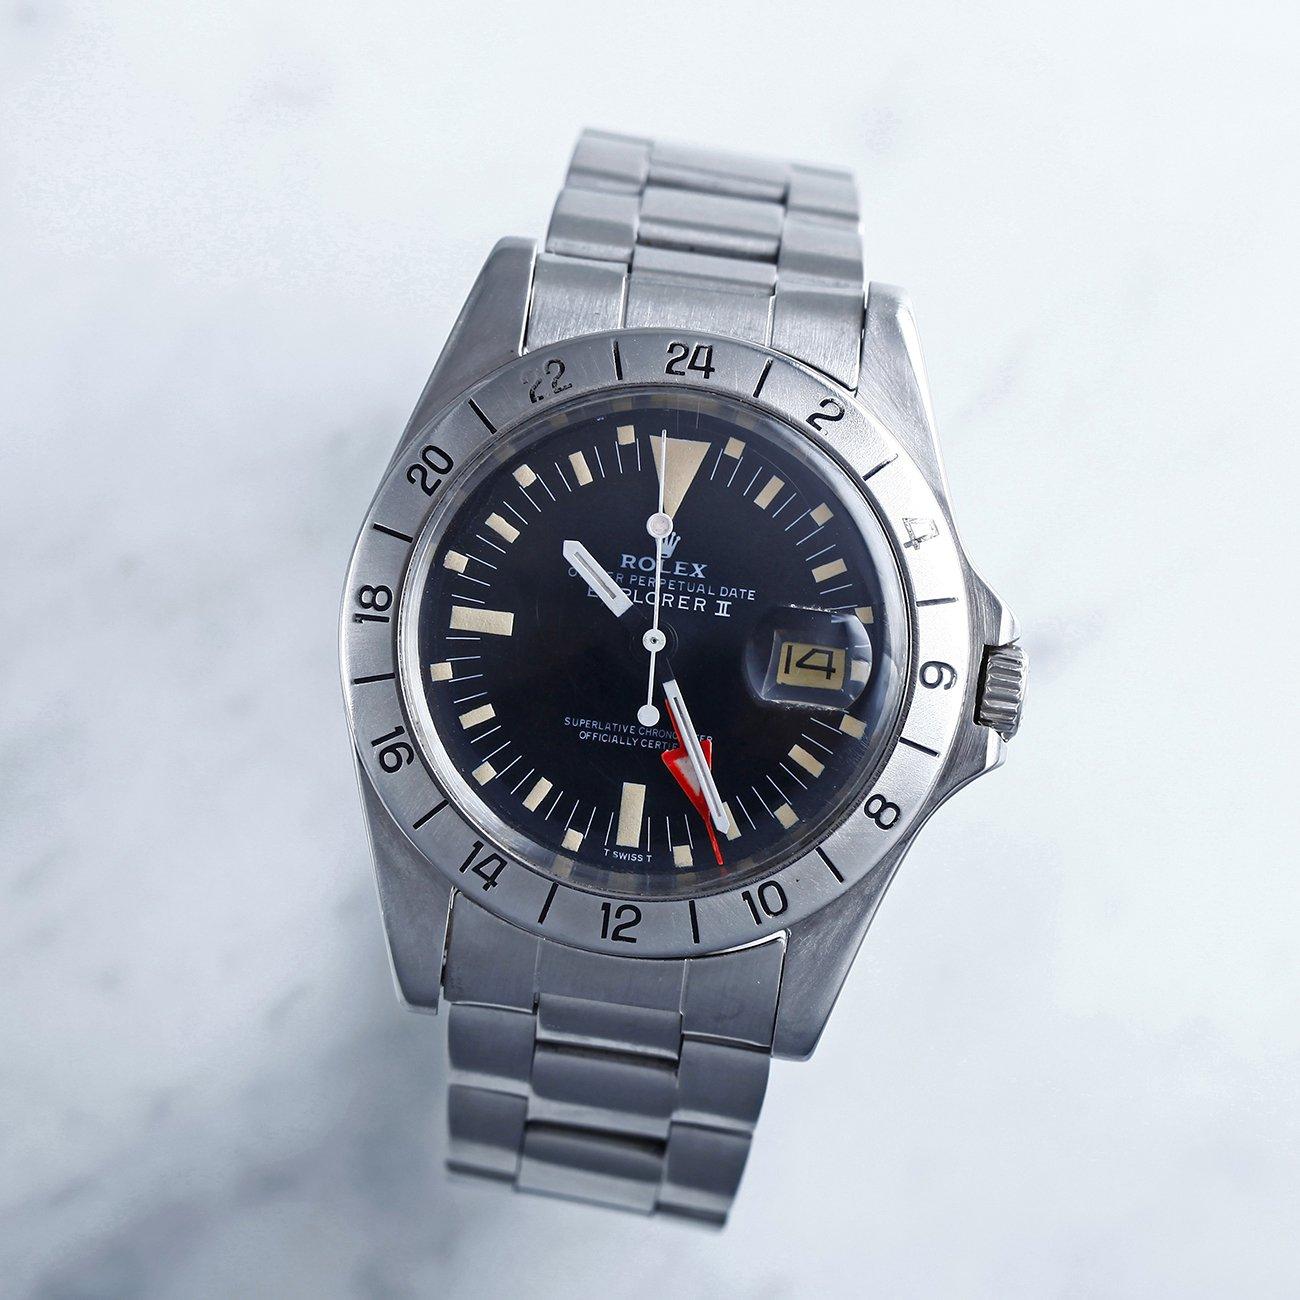 watch f9d19 89863 1973年 ロレックス エクスプローラーⅡ Ref.1655 初期型 ダブルロックブレス - アンティーク&オールディーズ オンラインストア